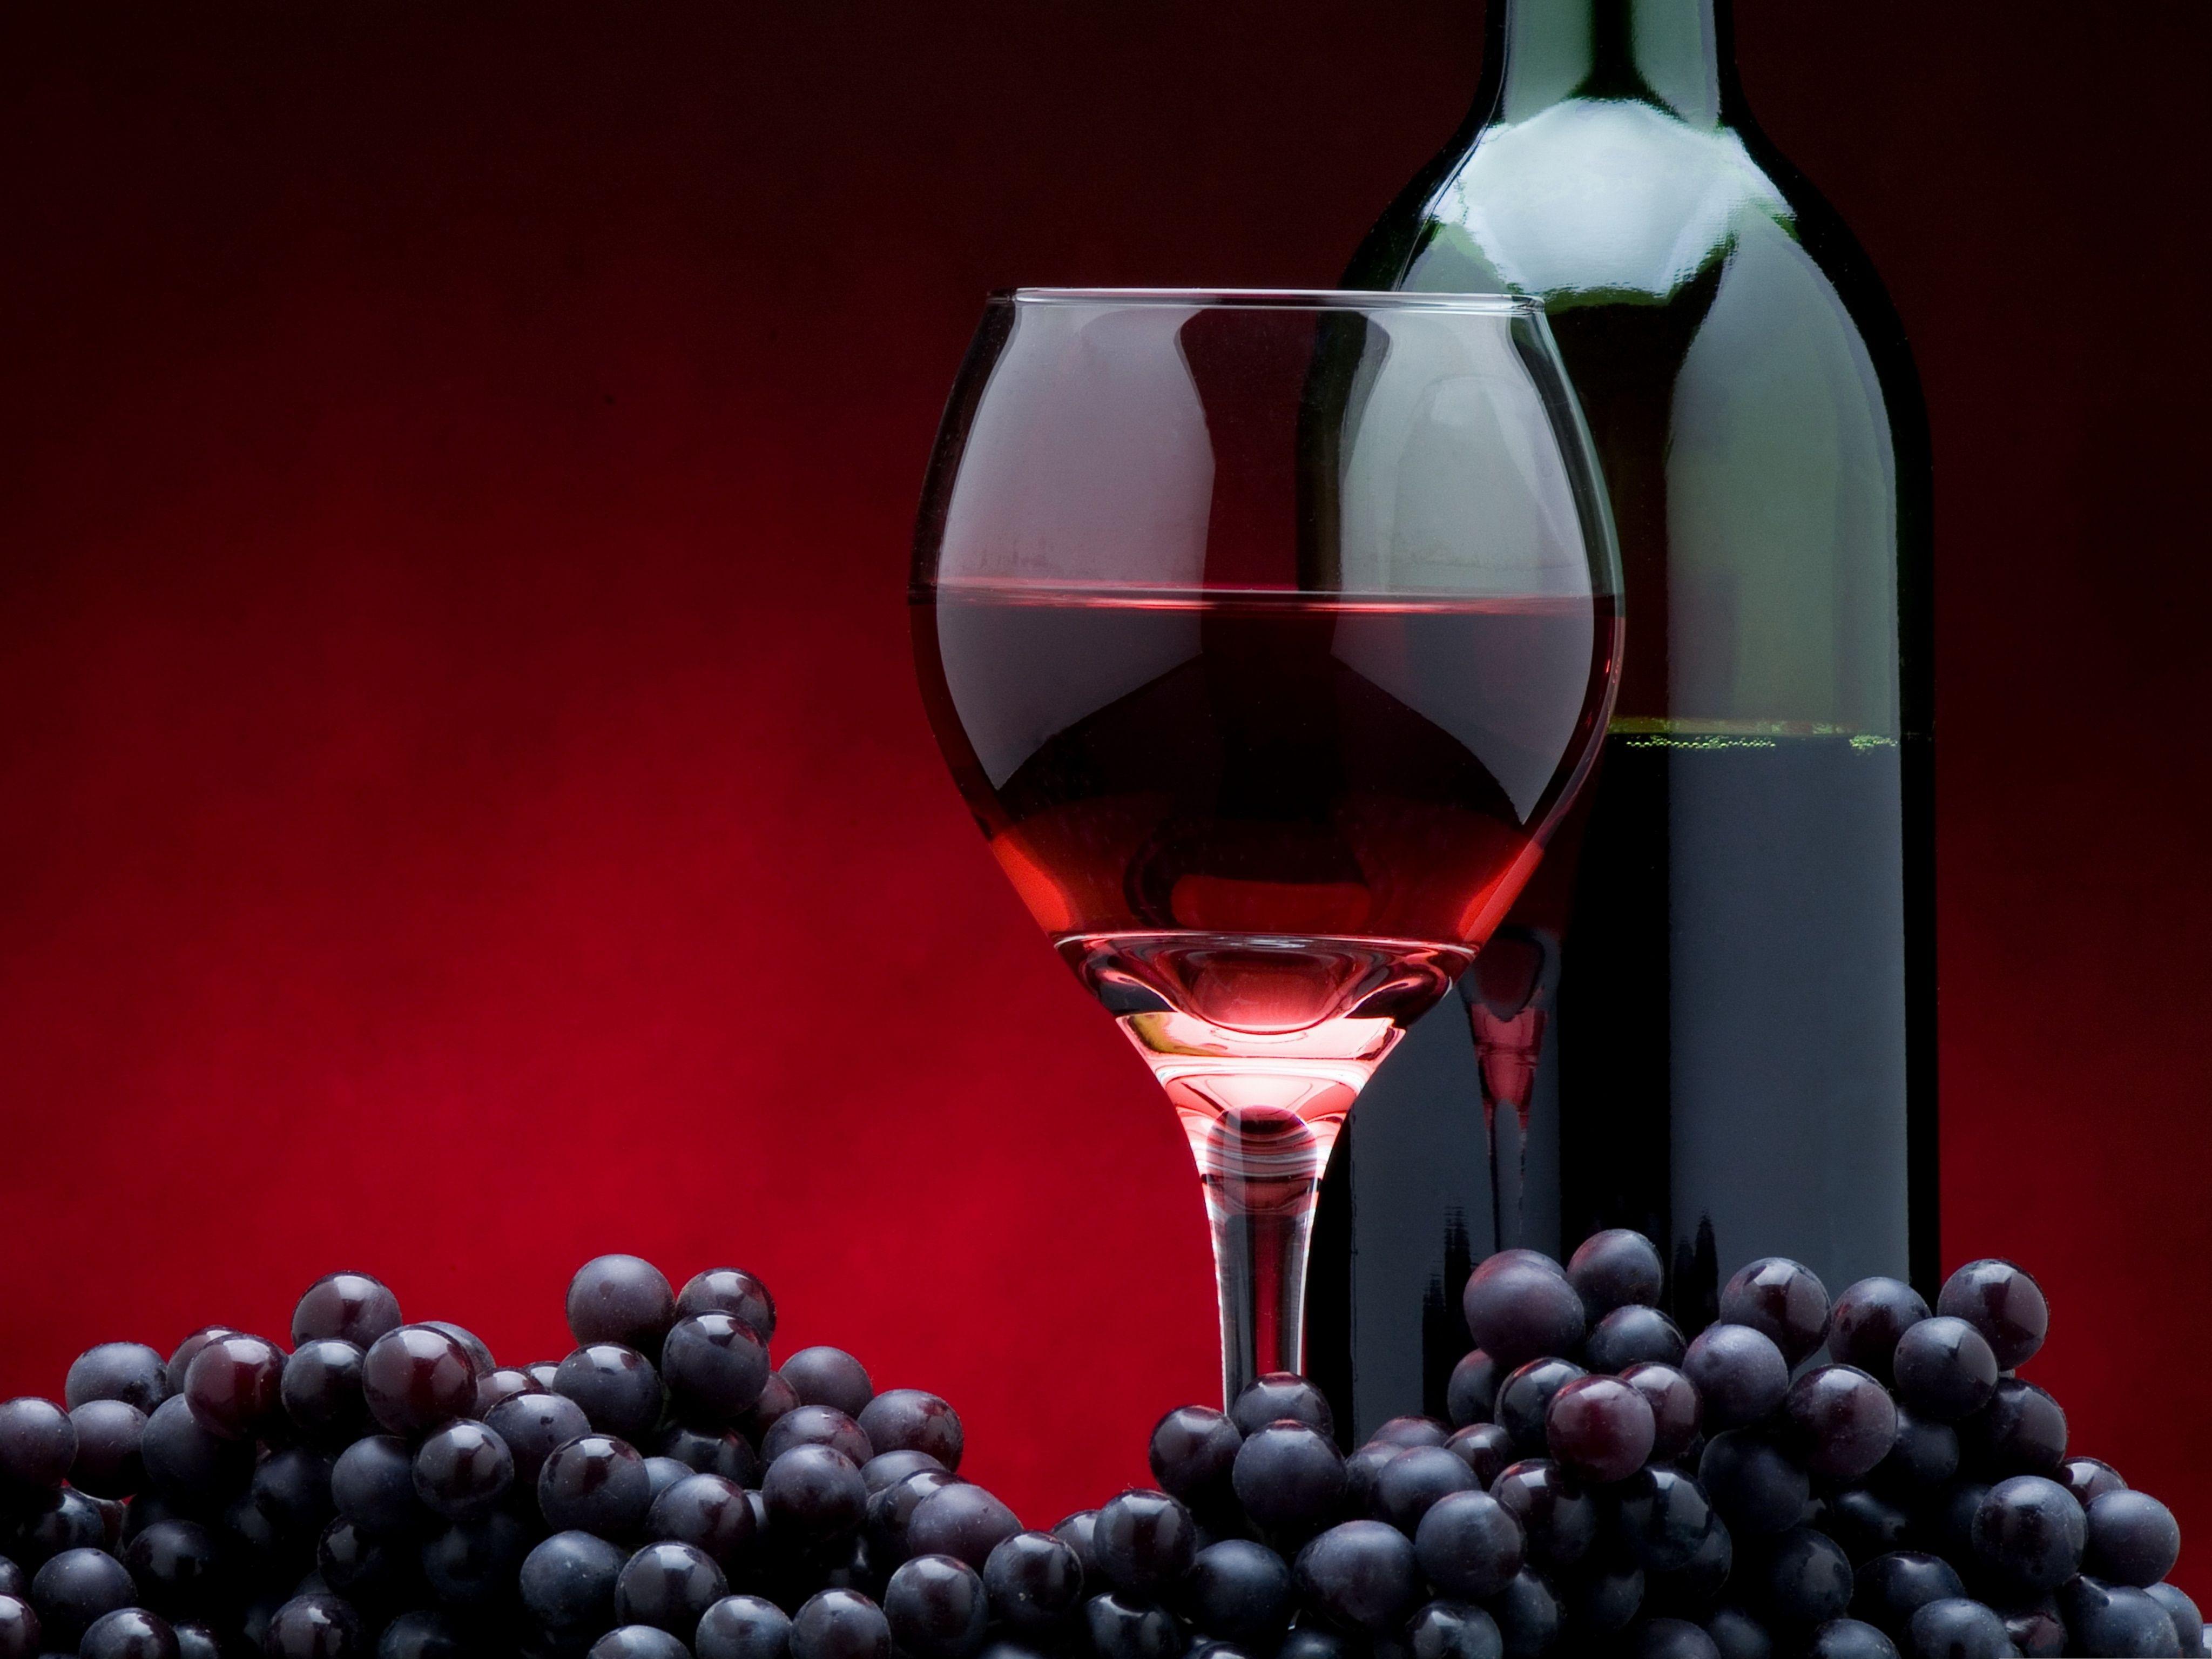 Computer Desktop Wallpaper With Red Wine Bottle Cup Grapes 4096x3072pixels Red Wine Red Wine Bottle Wine Culture